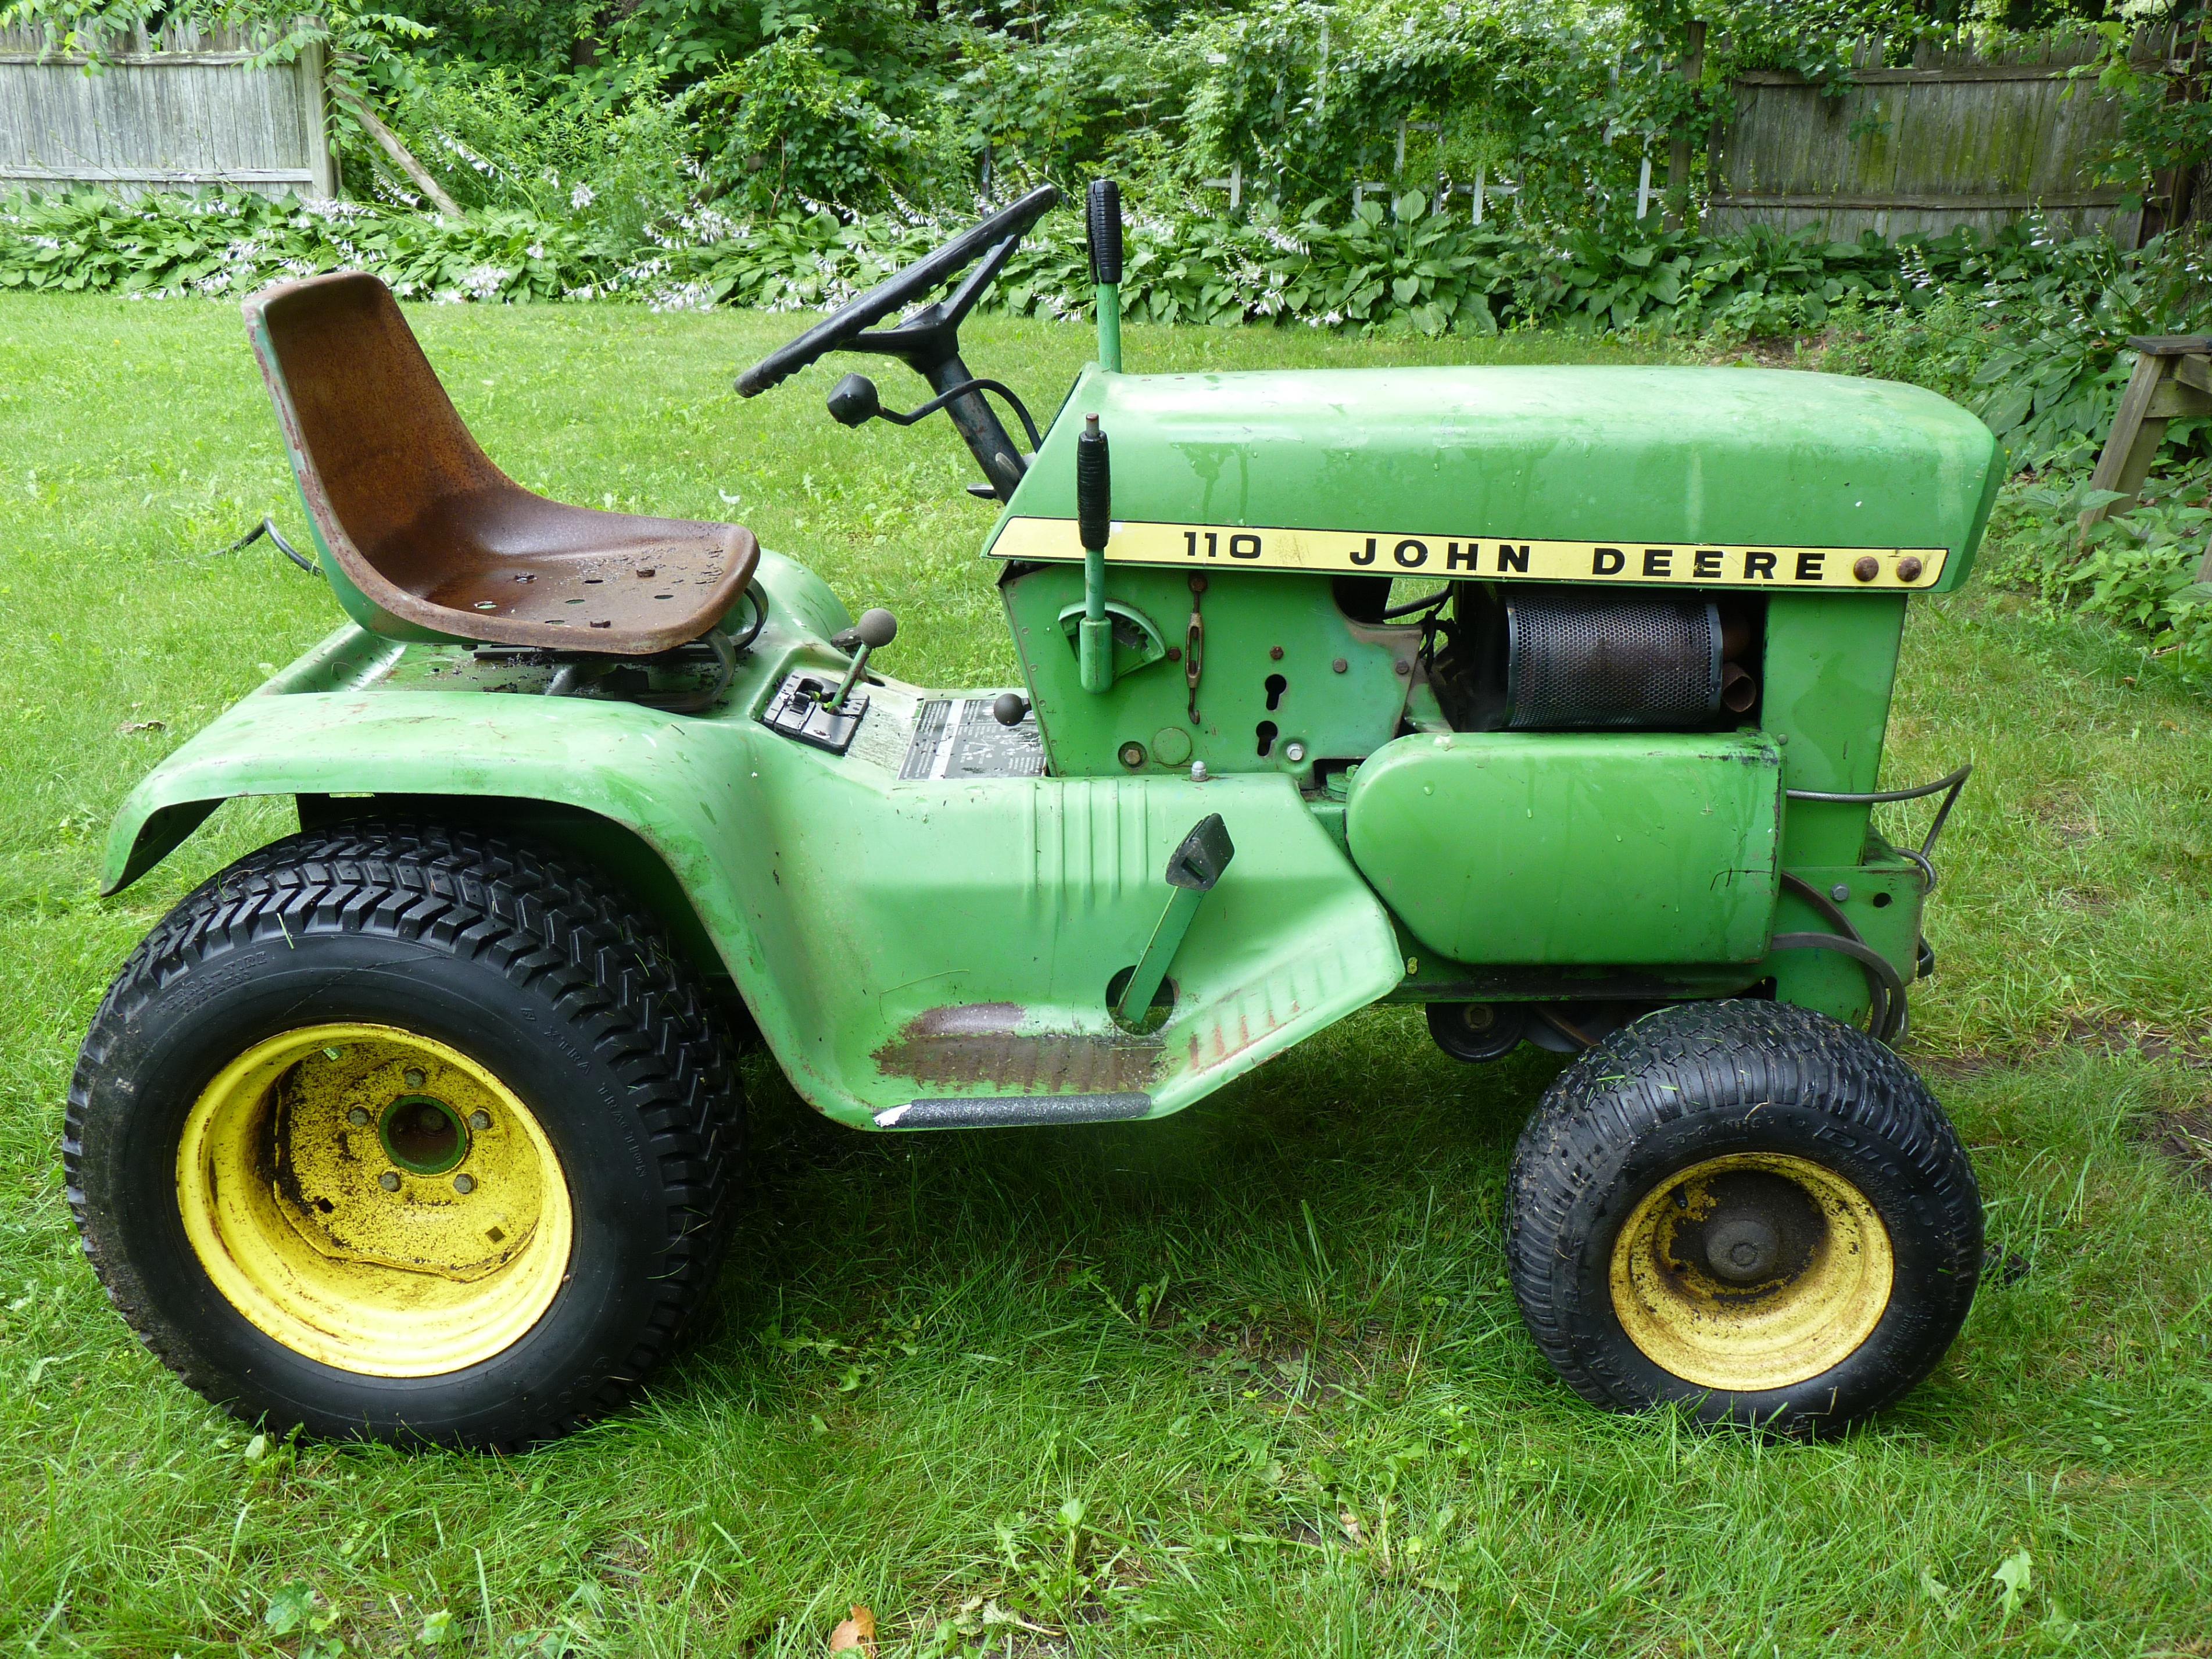 John Deere 110 Garden Tractor Attachments : New to me john deere  square fender question